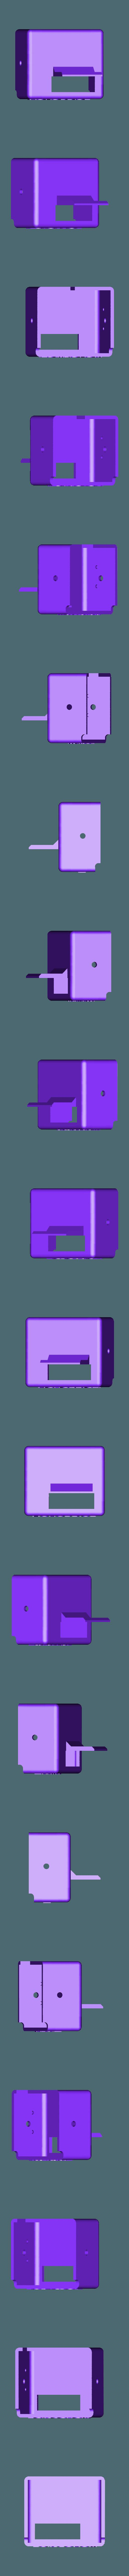 Monoprice_BondTech_Ribbon_Cable_Holder_v1_v10.stl Download free STL file Wanhao D6 / Duplicator 6 / Monoprice Ultimate Maker Ribbon Cable Holder for BondTech • 3D print object, nik101968